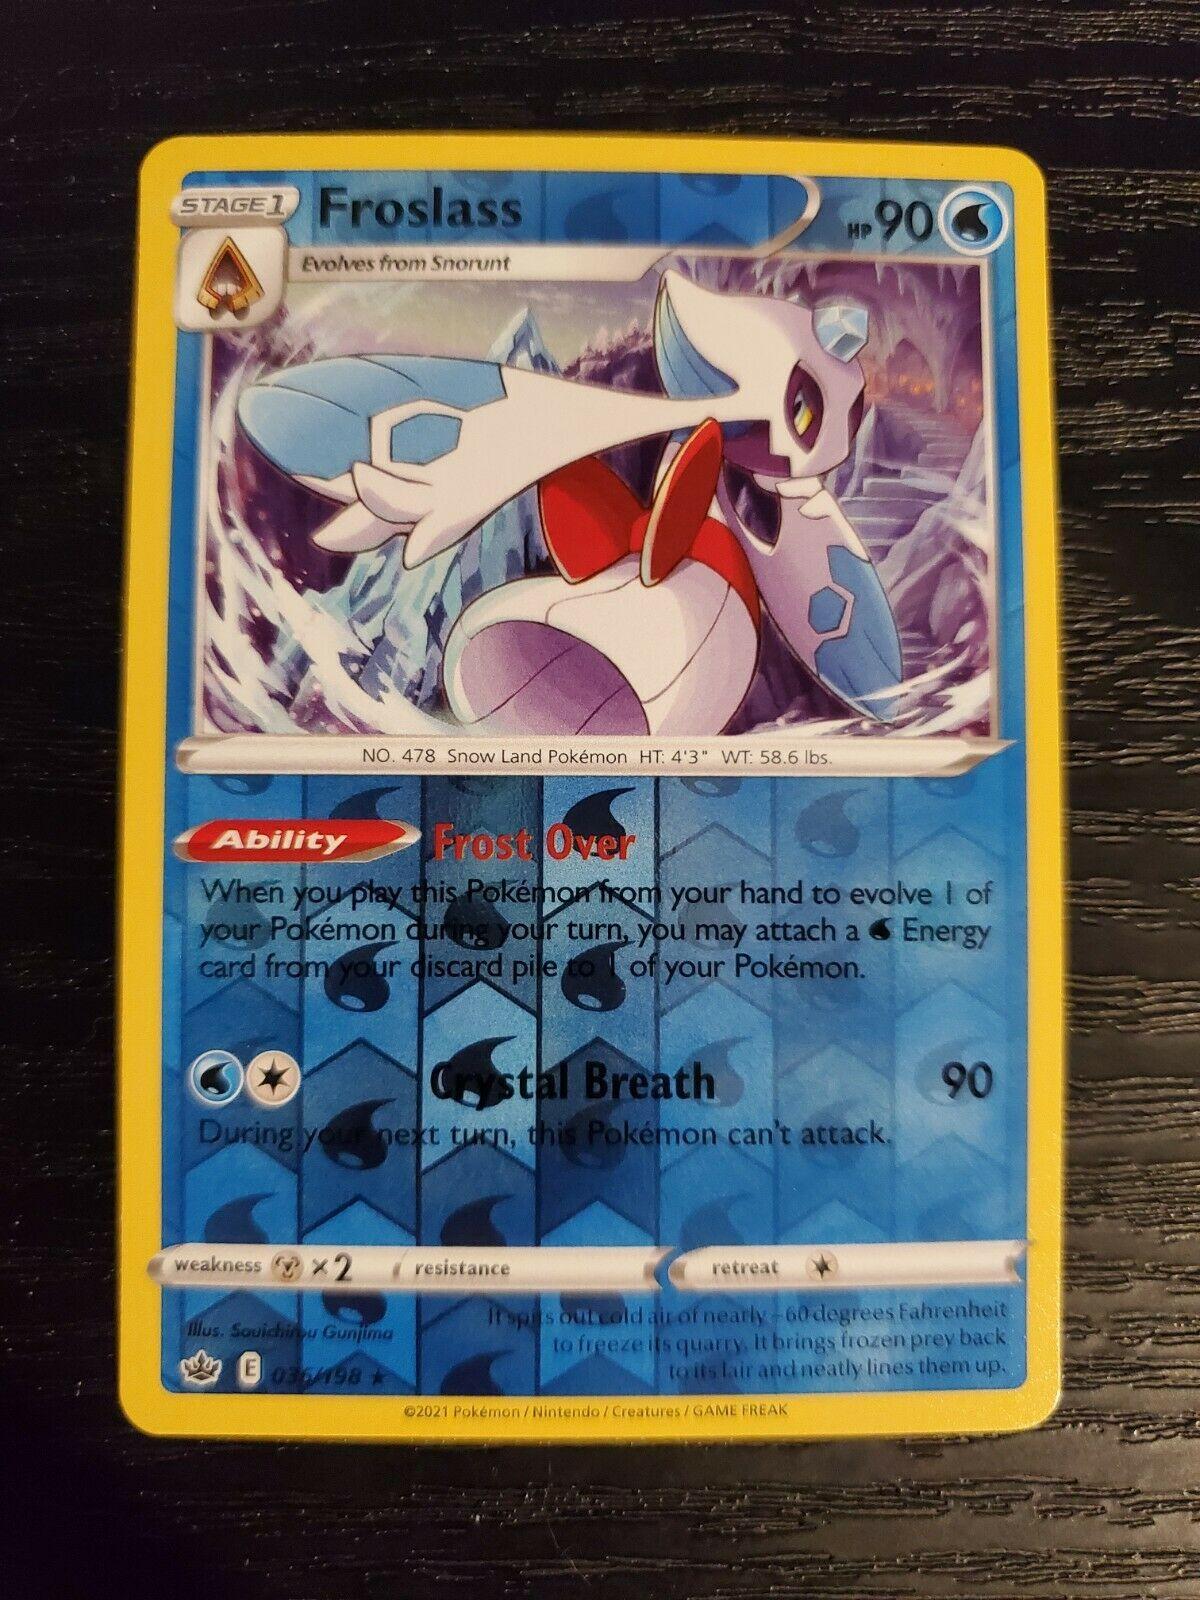 Froslass 036/198 Chilling Reign Reverse Holo Pokemon Card NM